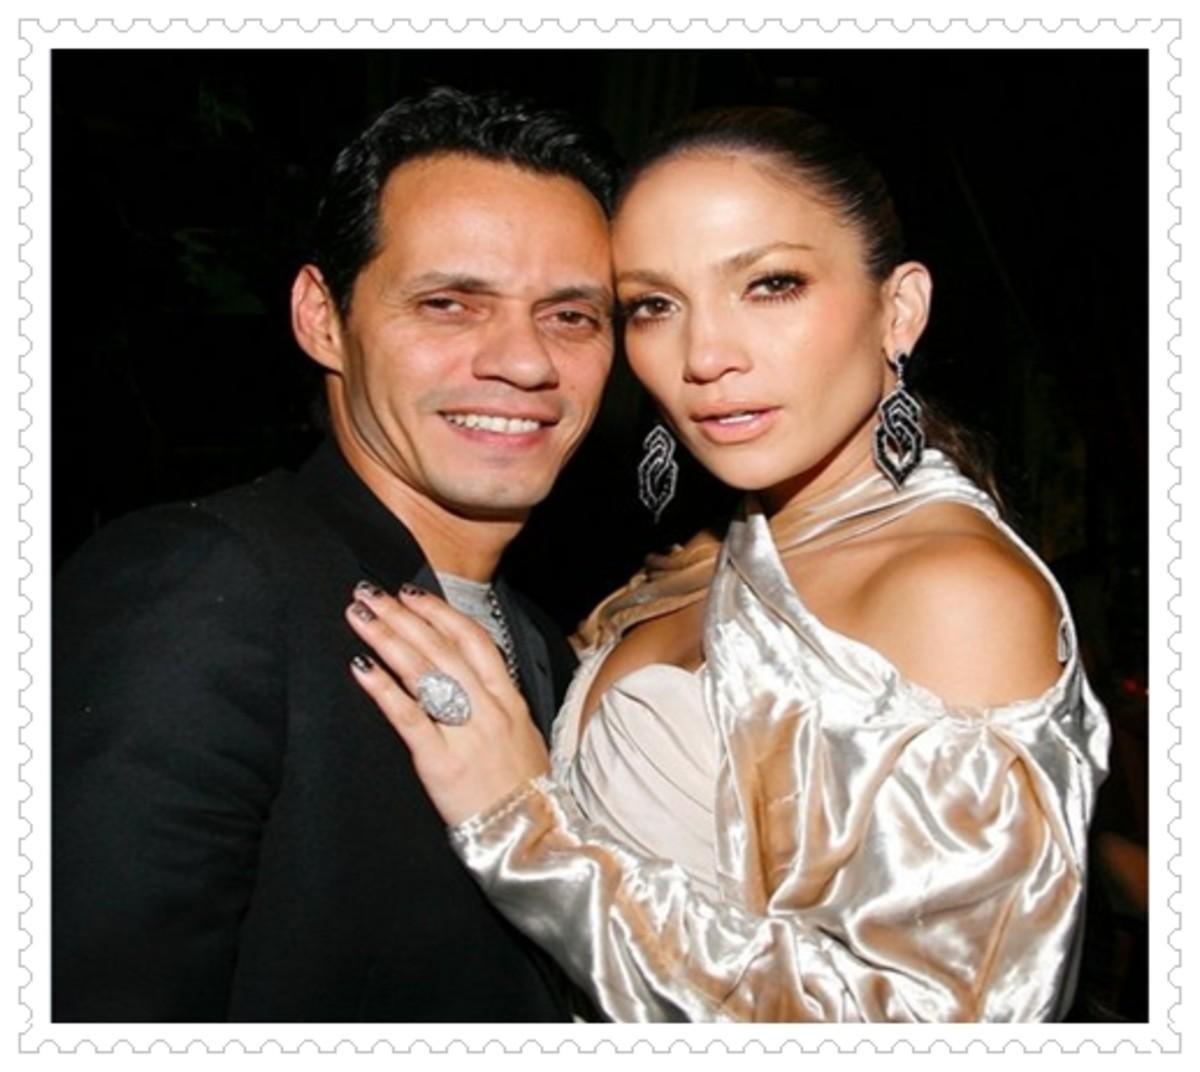 Marc Antony and Jennifer Lopez